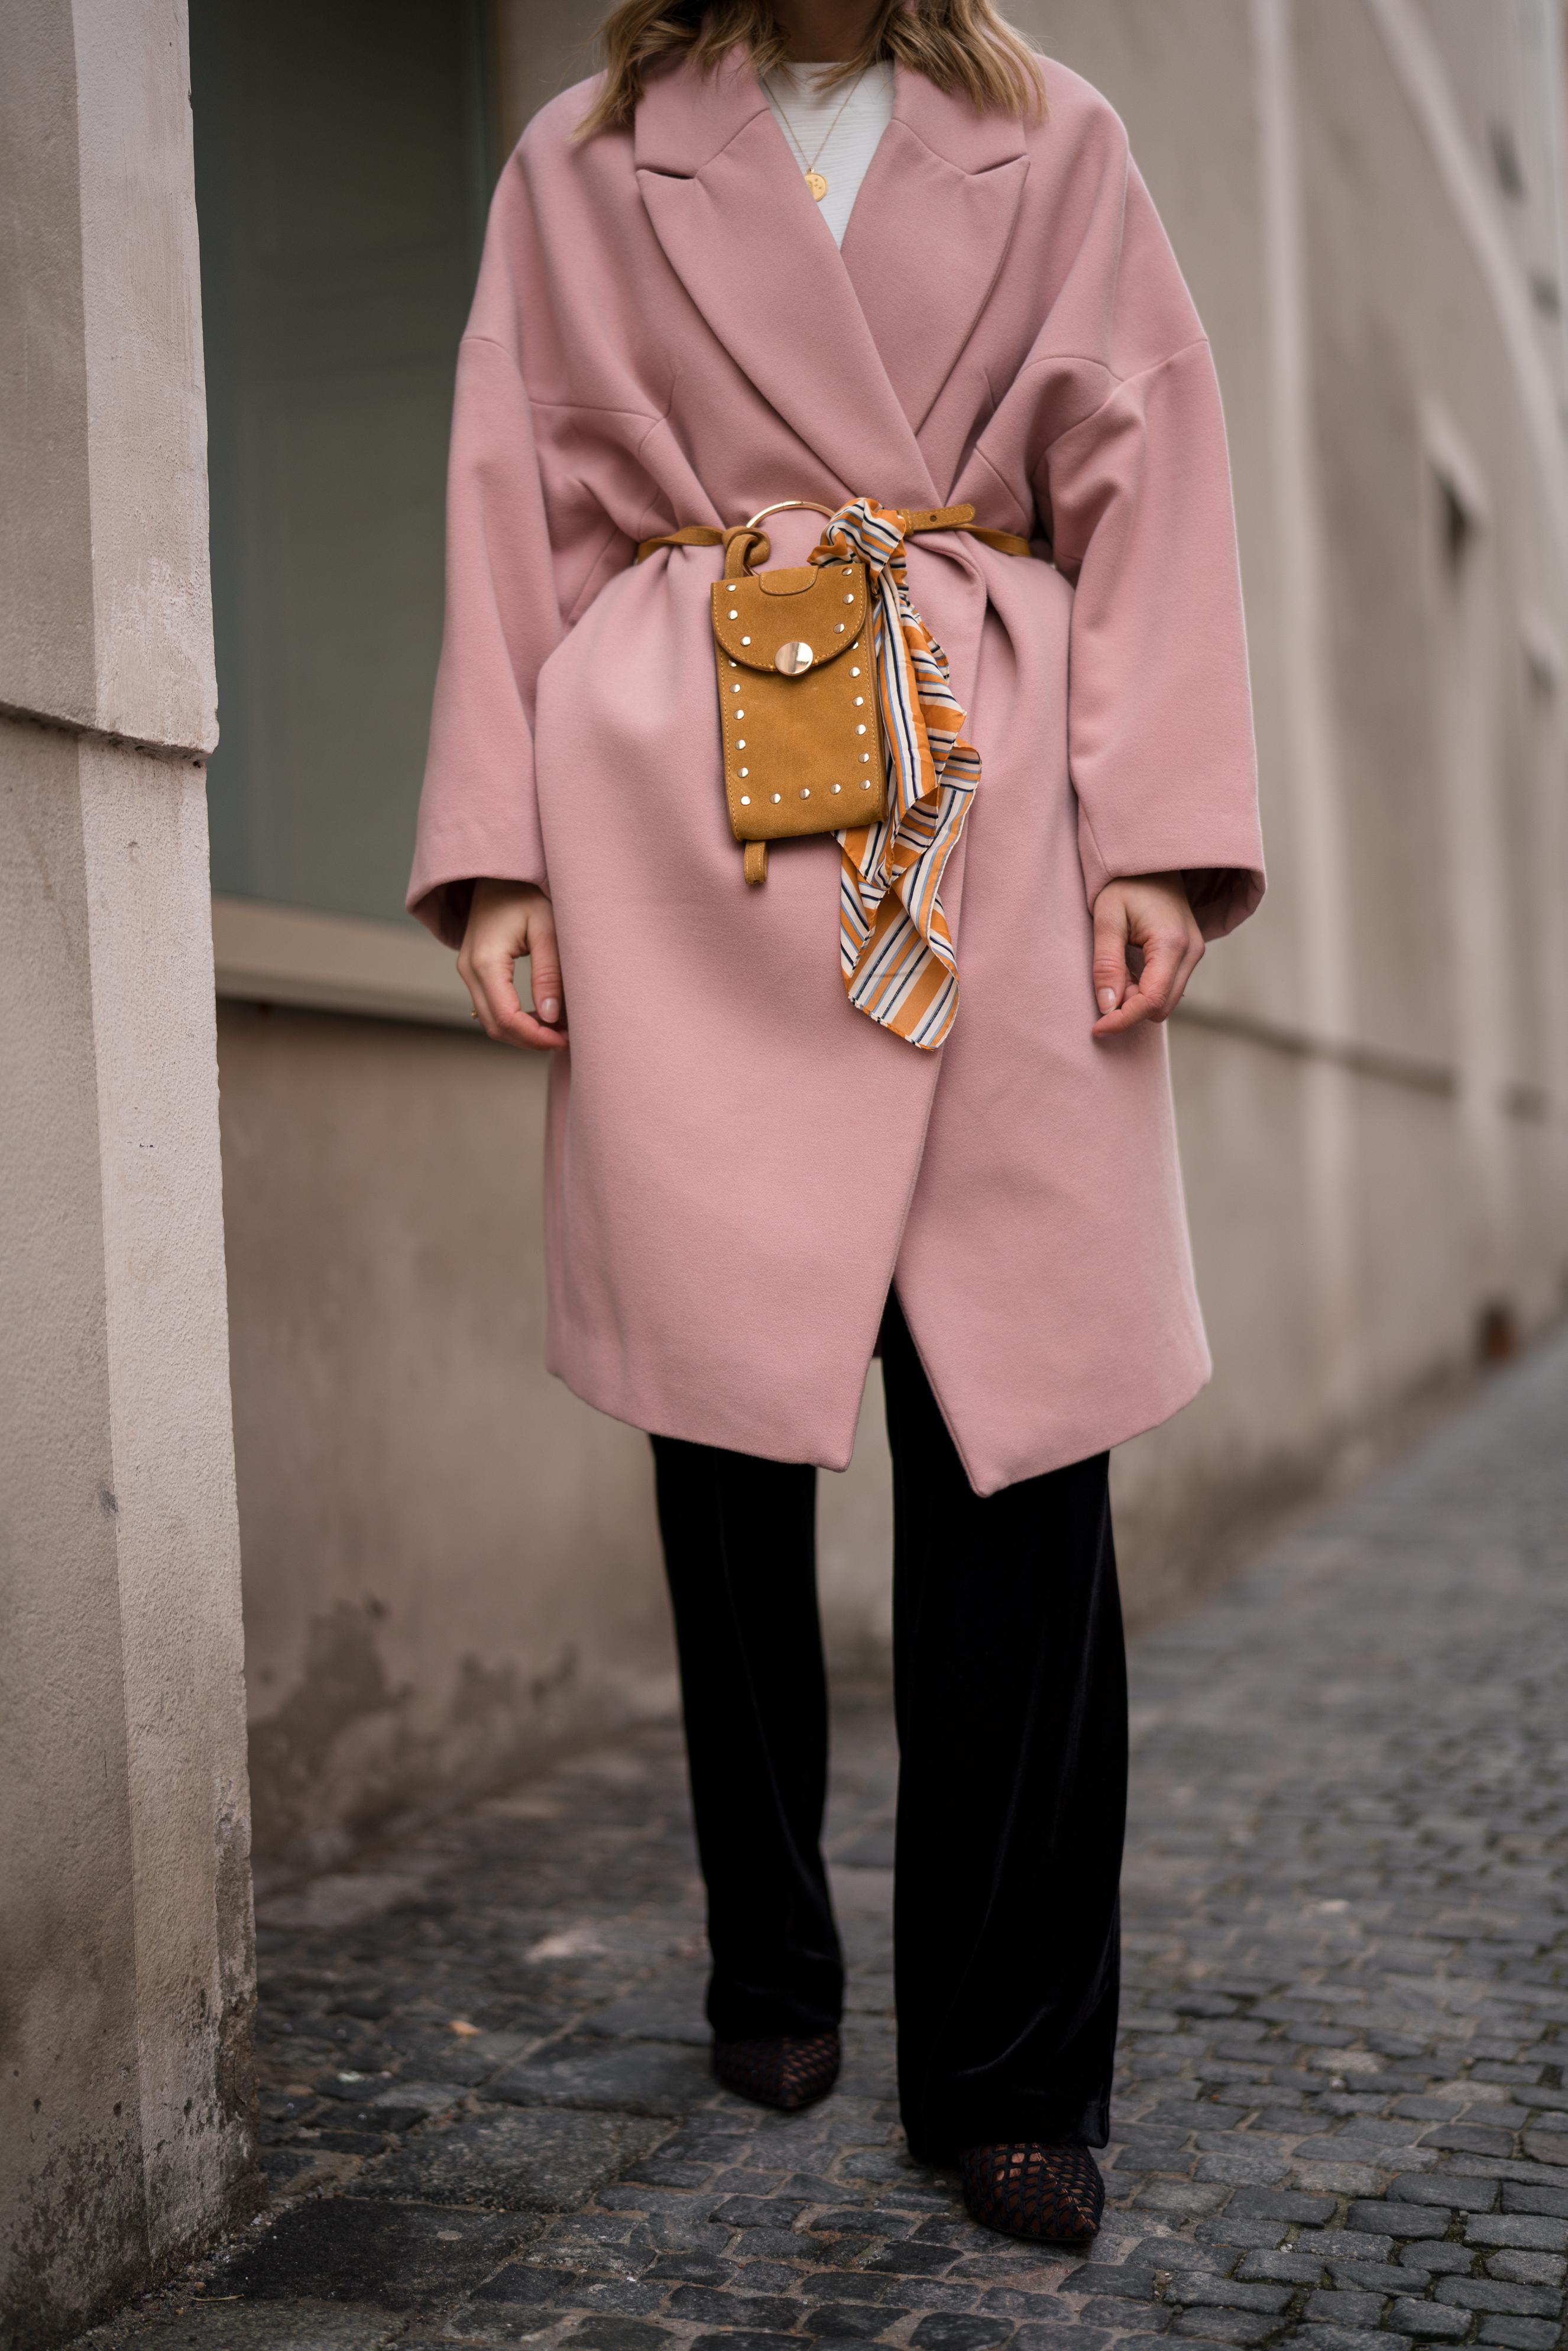 Pink Coat, Suede Belt Bag Velvet Pants rosa Mantel Seidentuch Fashion Week Berlin Jakes Samthose oversize Streetstyle Sariety Fashionblogger Modeblog Heidelberg_6